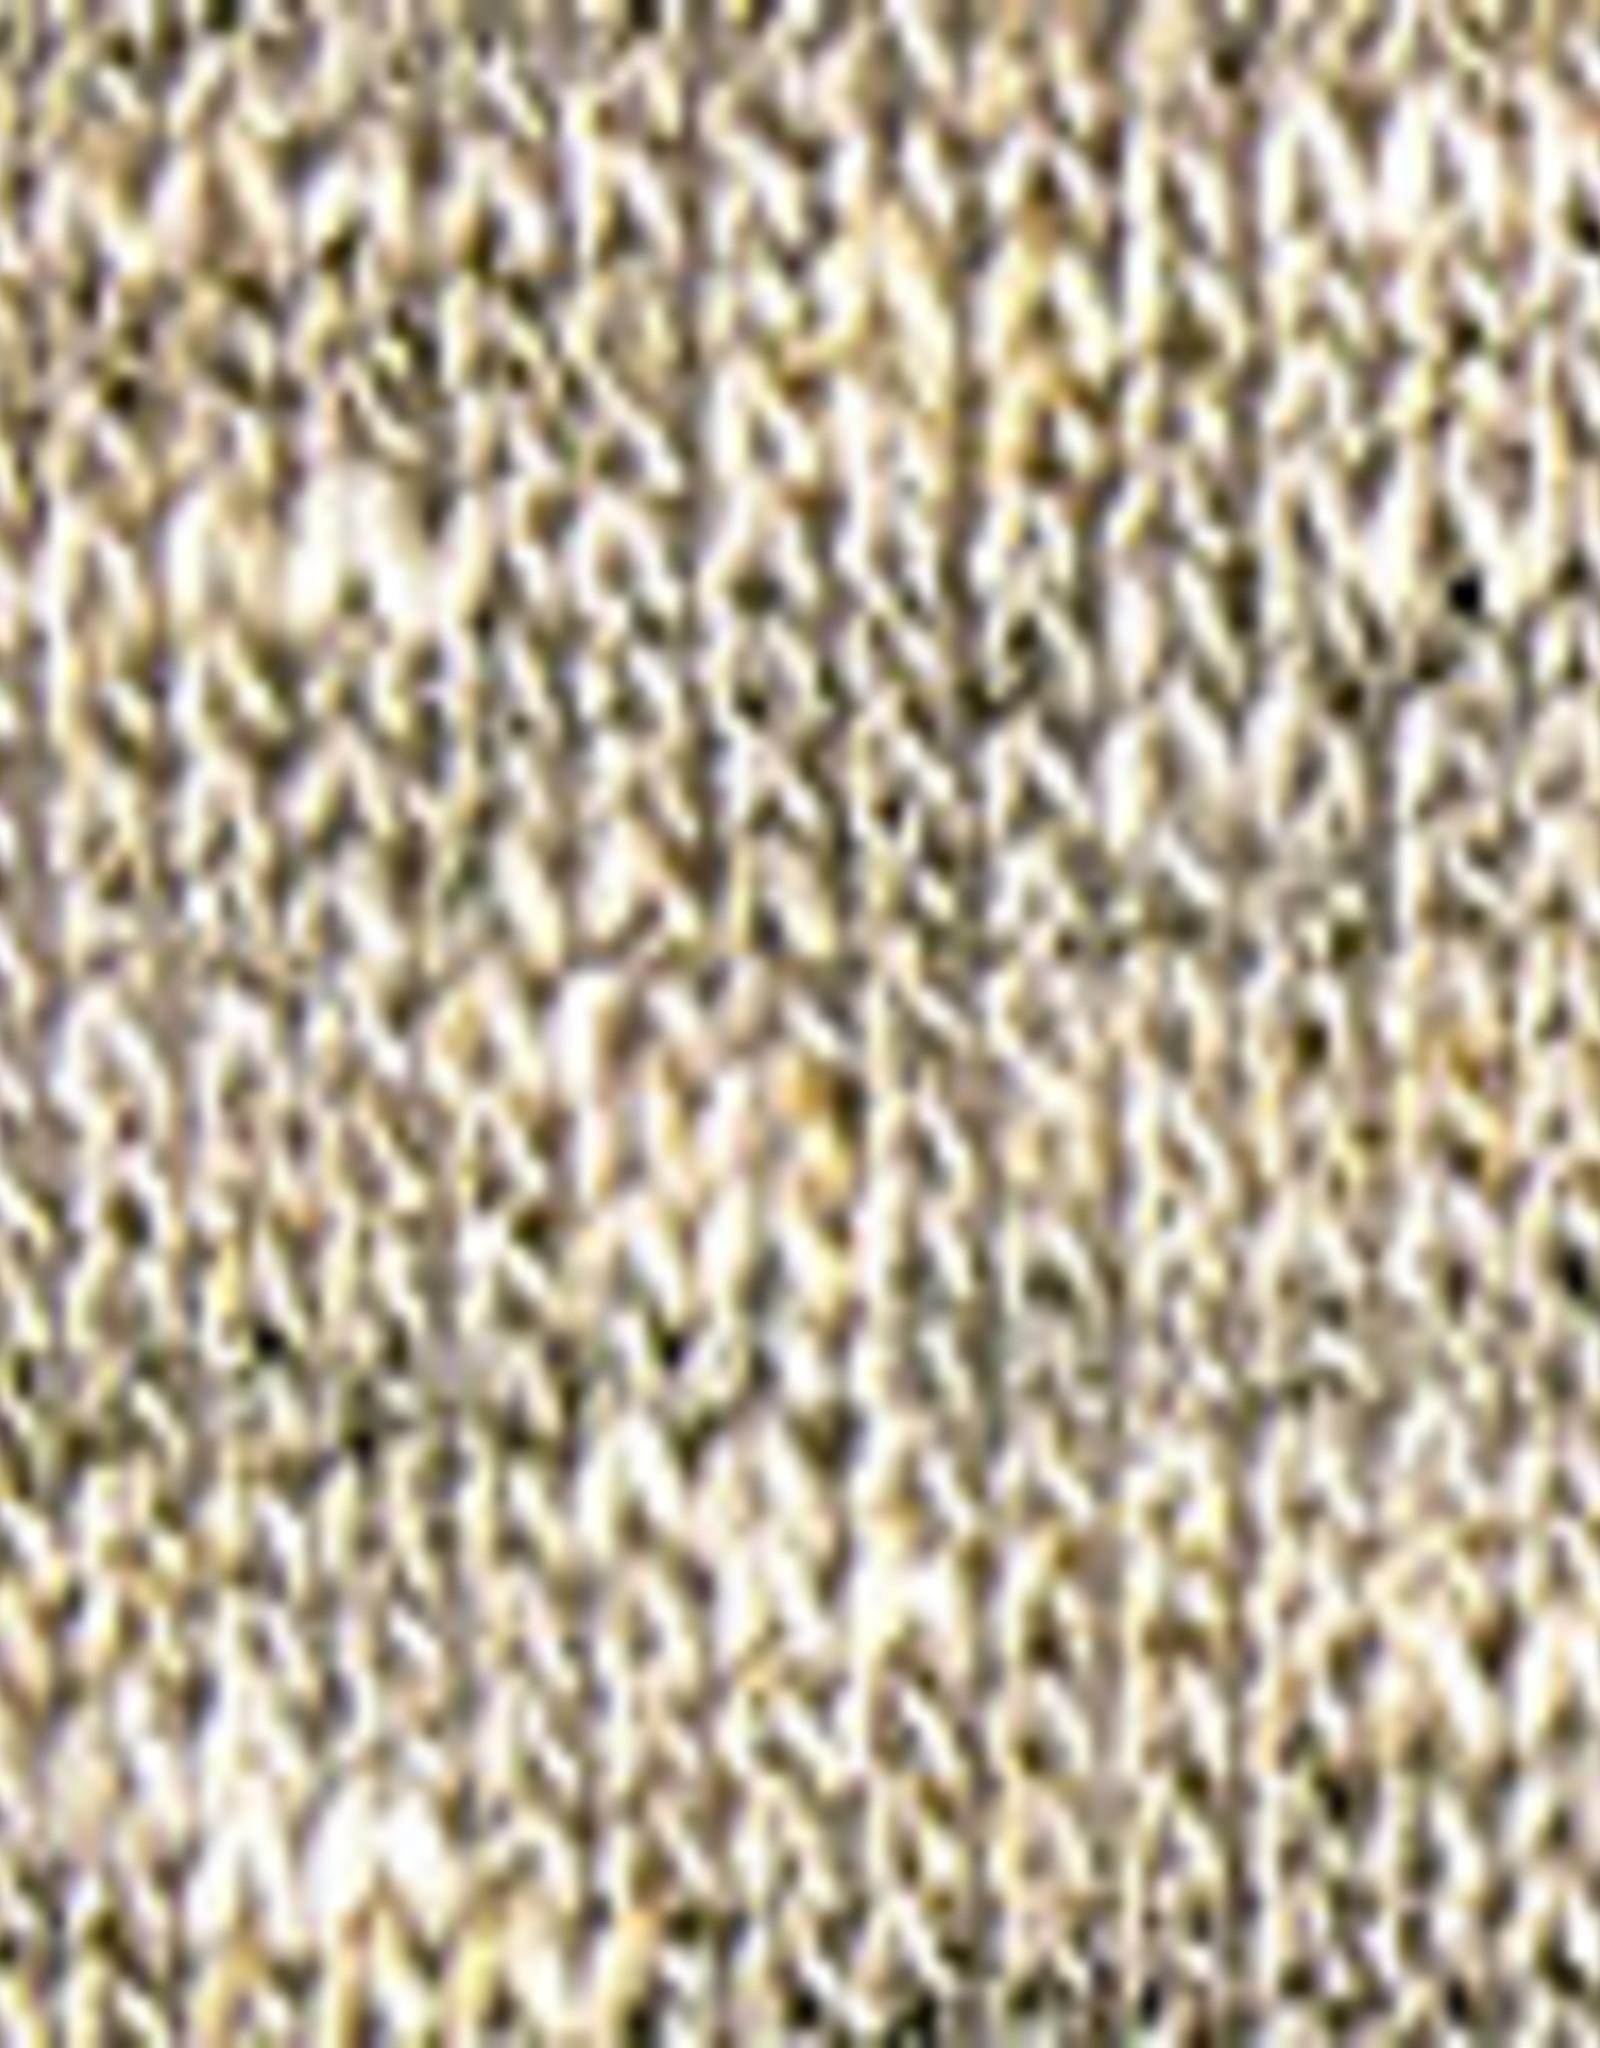 Katia Katia Polynesia 202 - Kaki-Medium paars-Licht geel